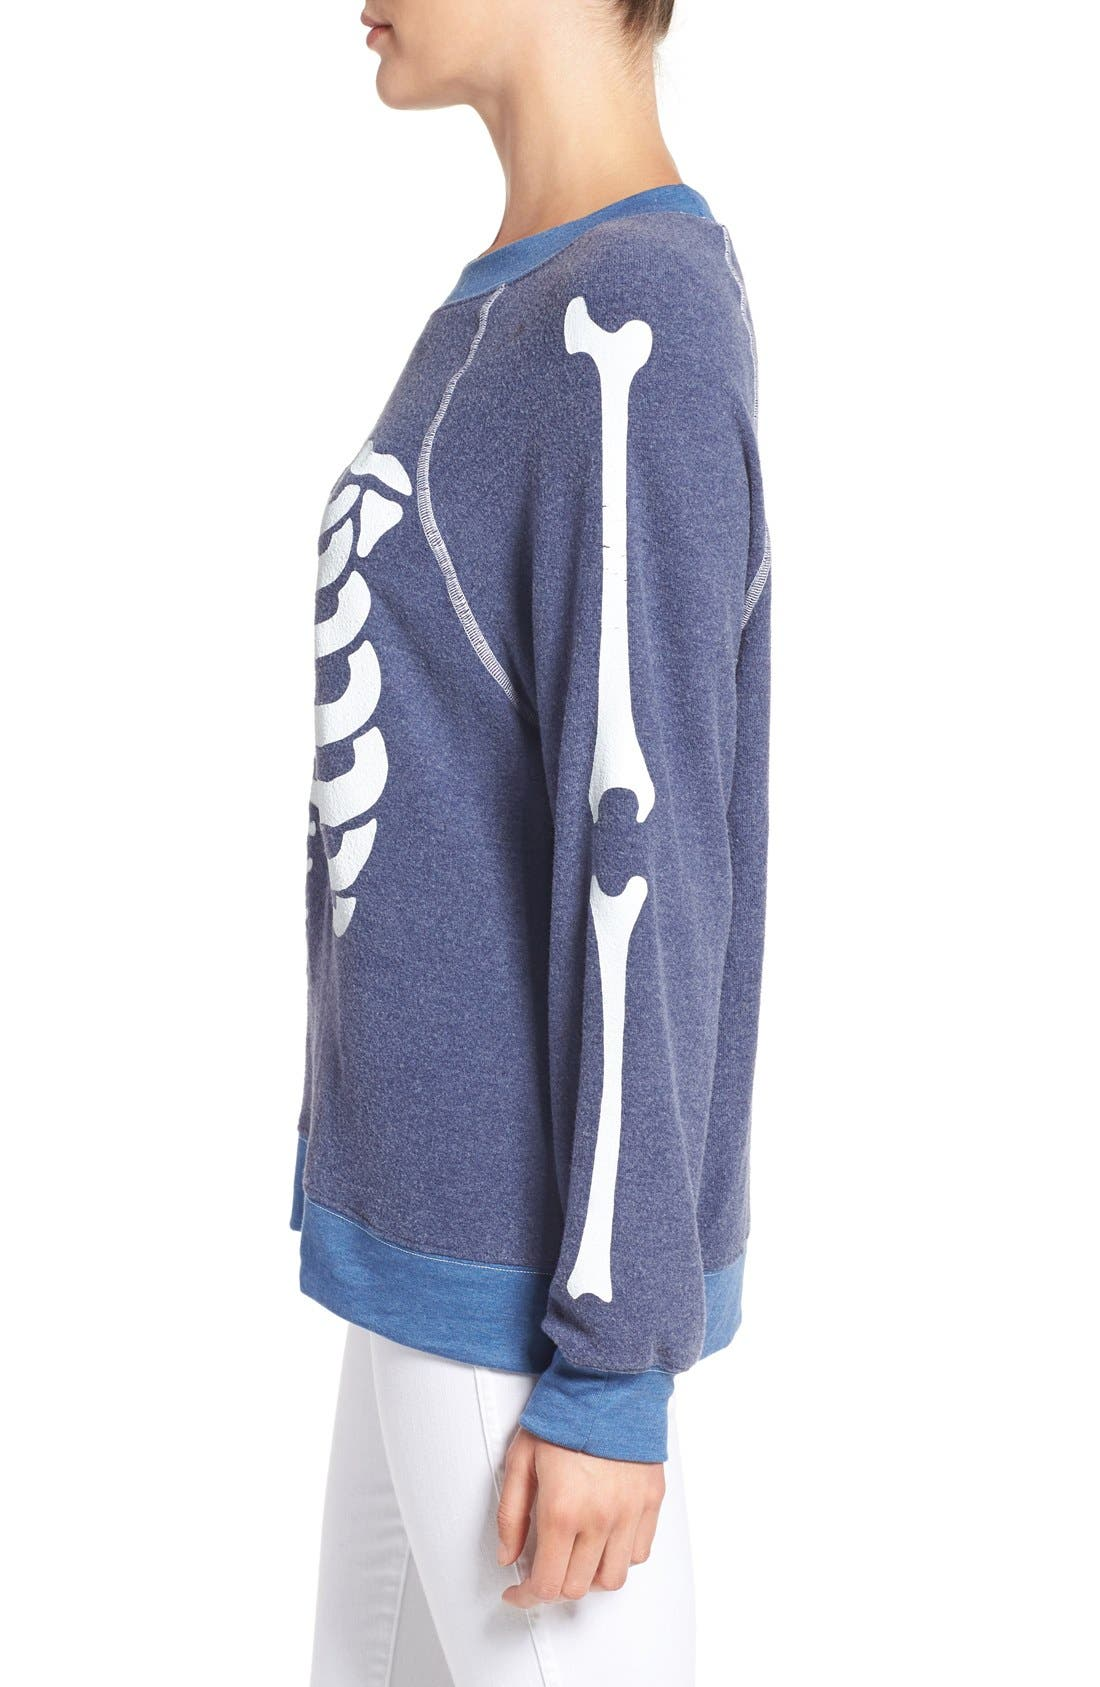 'Inside Out' Skeleton Print Pullover,                             Alternate thumbnail 3, color,                             401